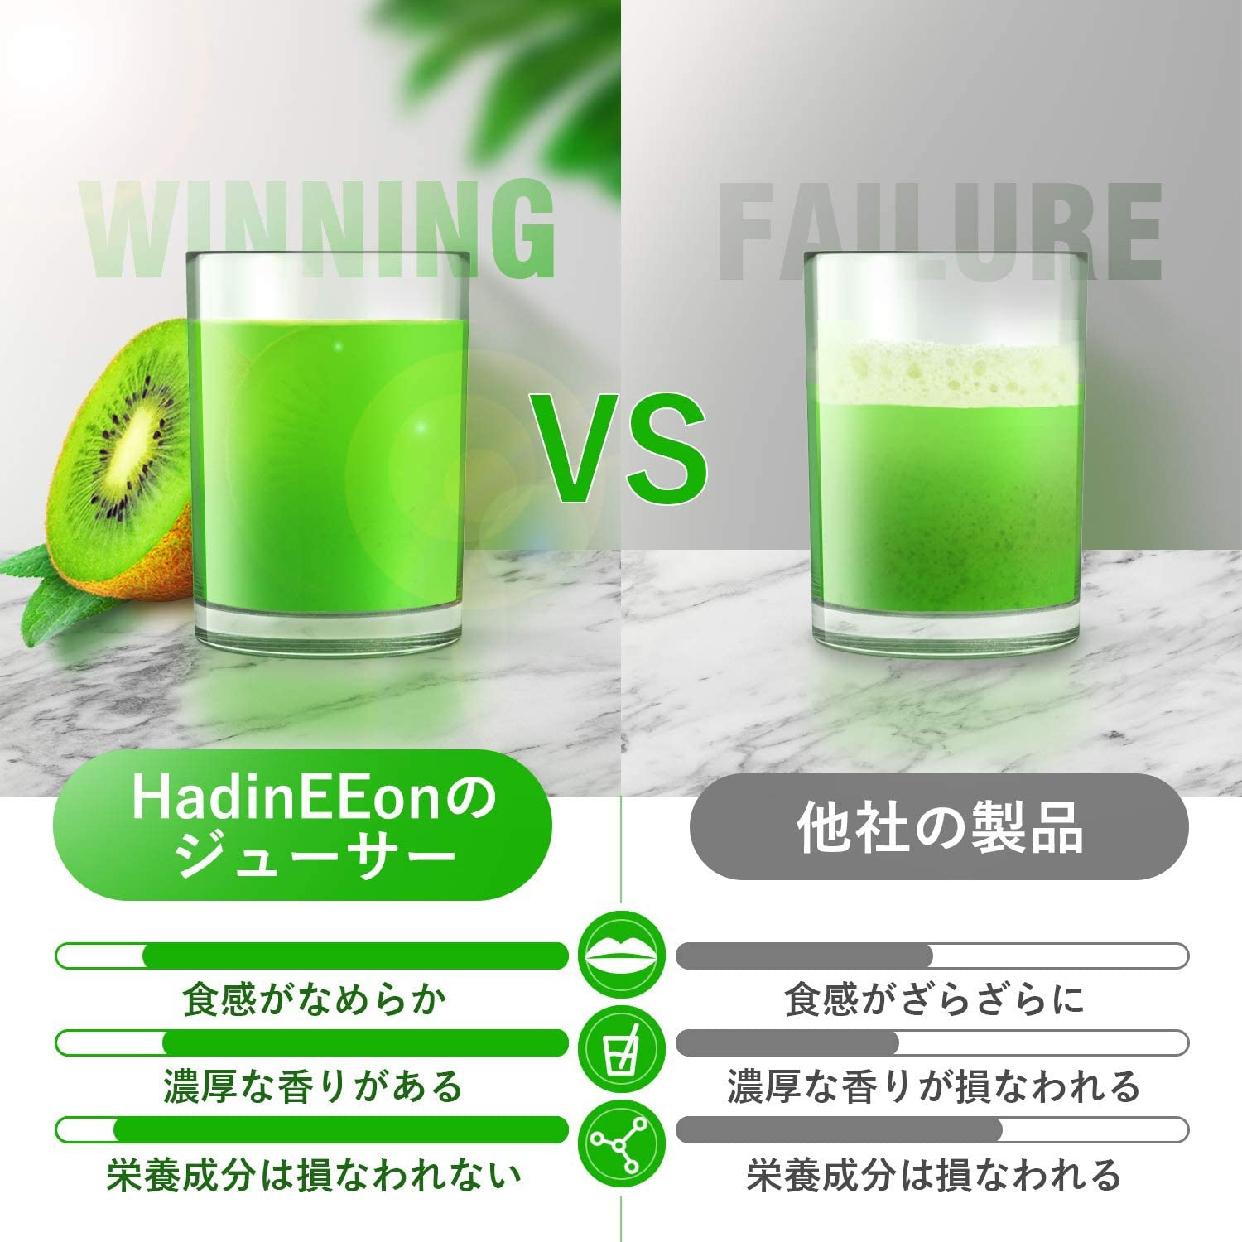 HadinEEon(ハディンイオン)ジューサーの商品画像3